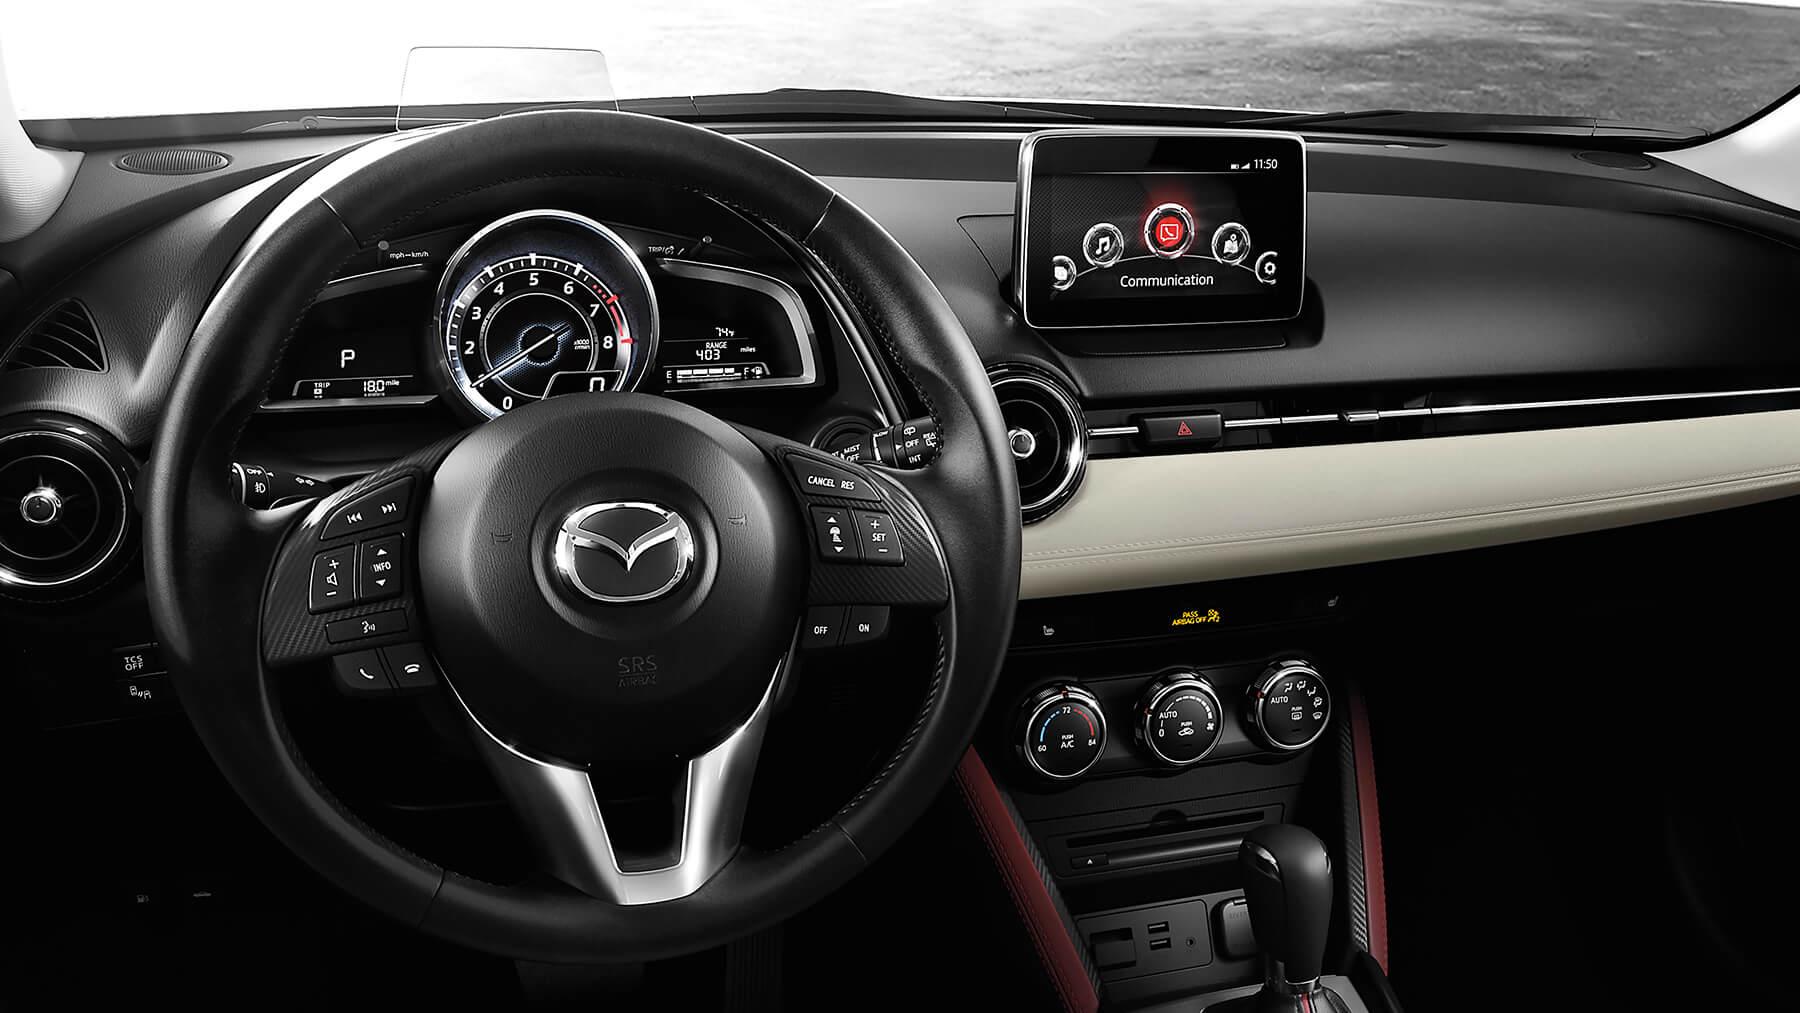 2018 Mazda CX-3 Leasing near Augusta, GA - Gerald Jones Mazda